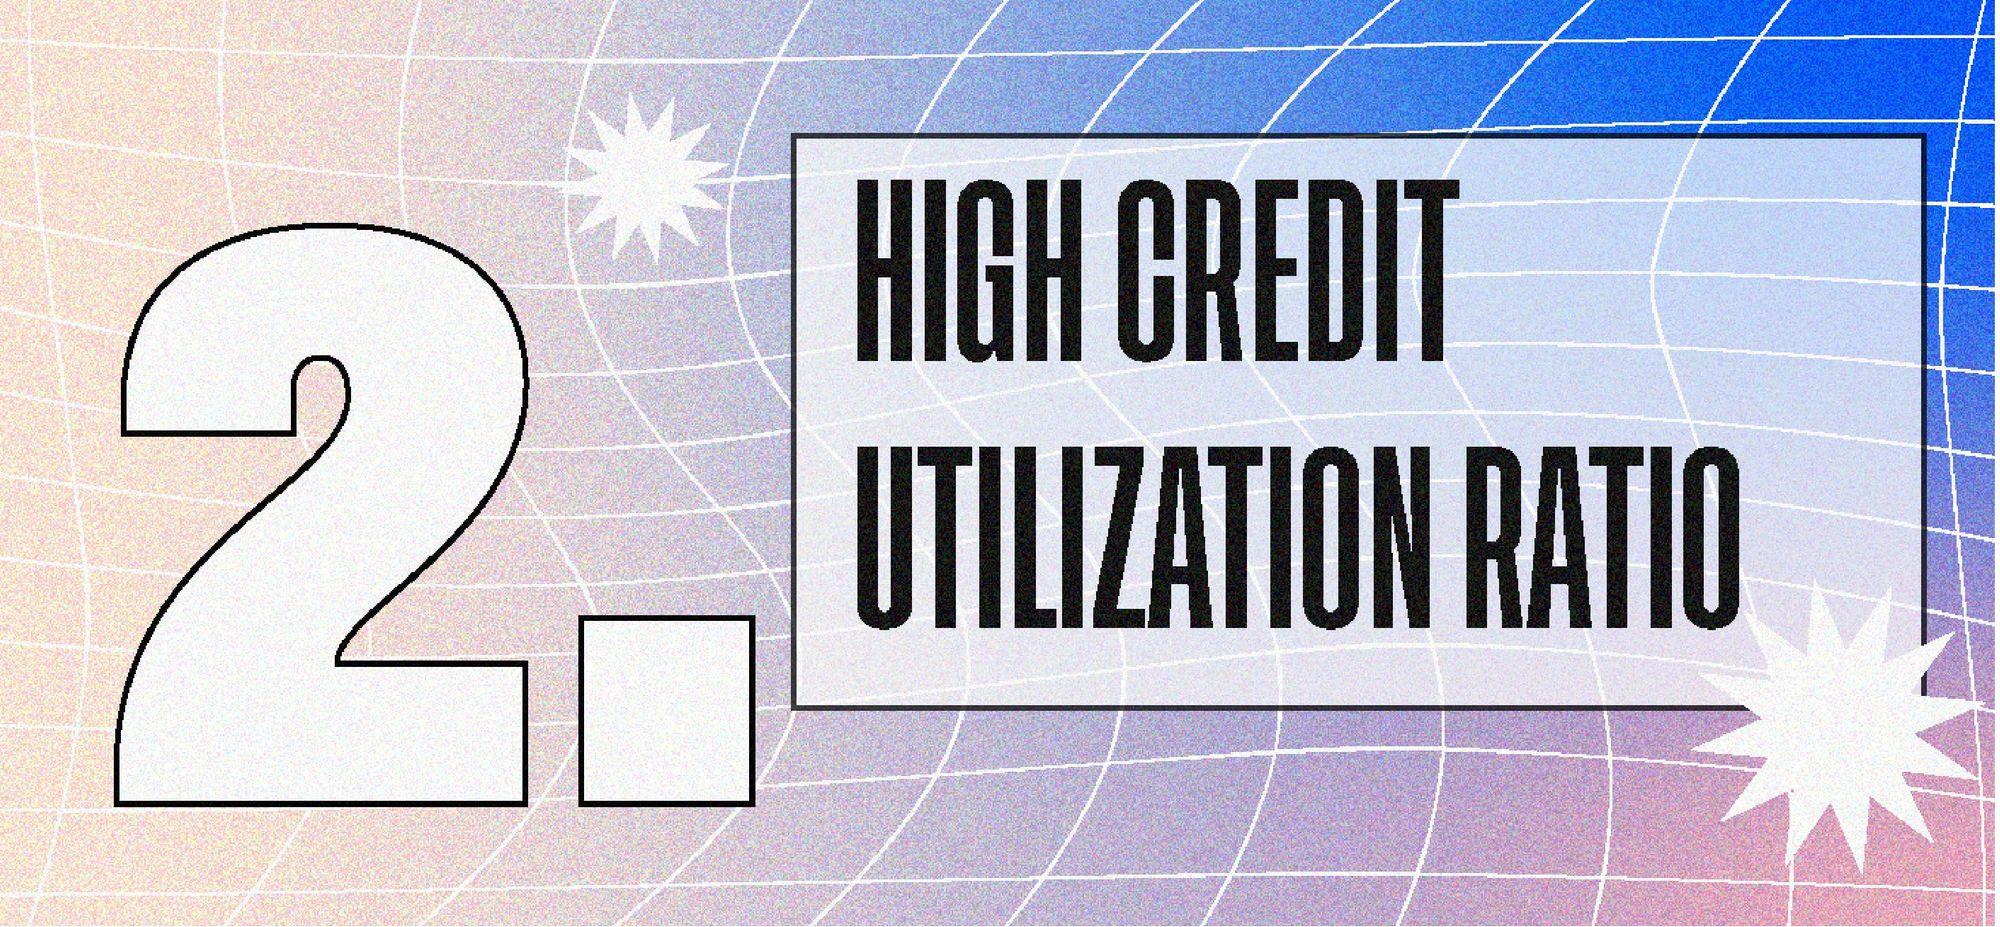 High Credit Utilization Ratio